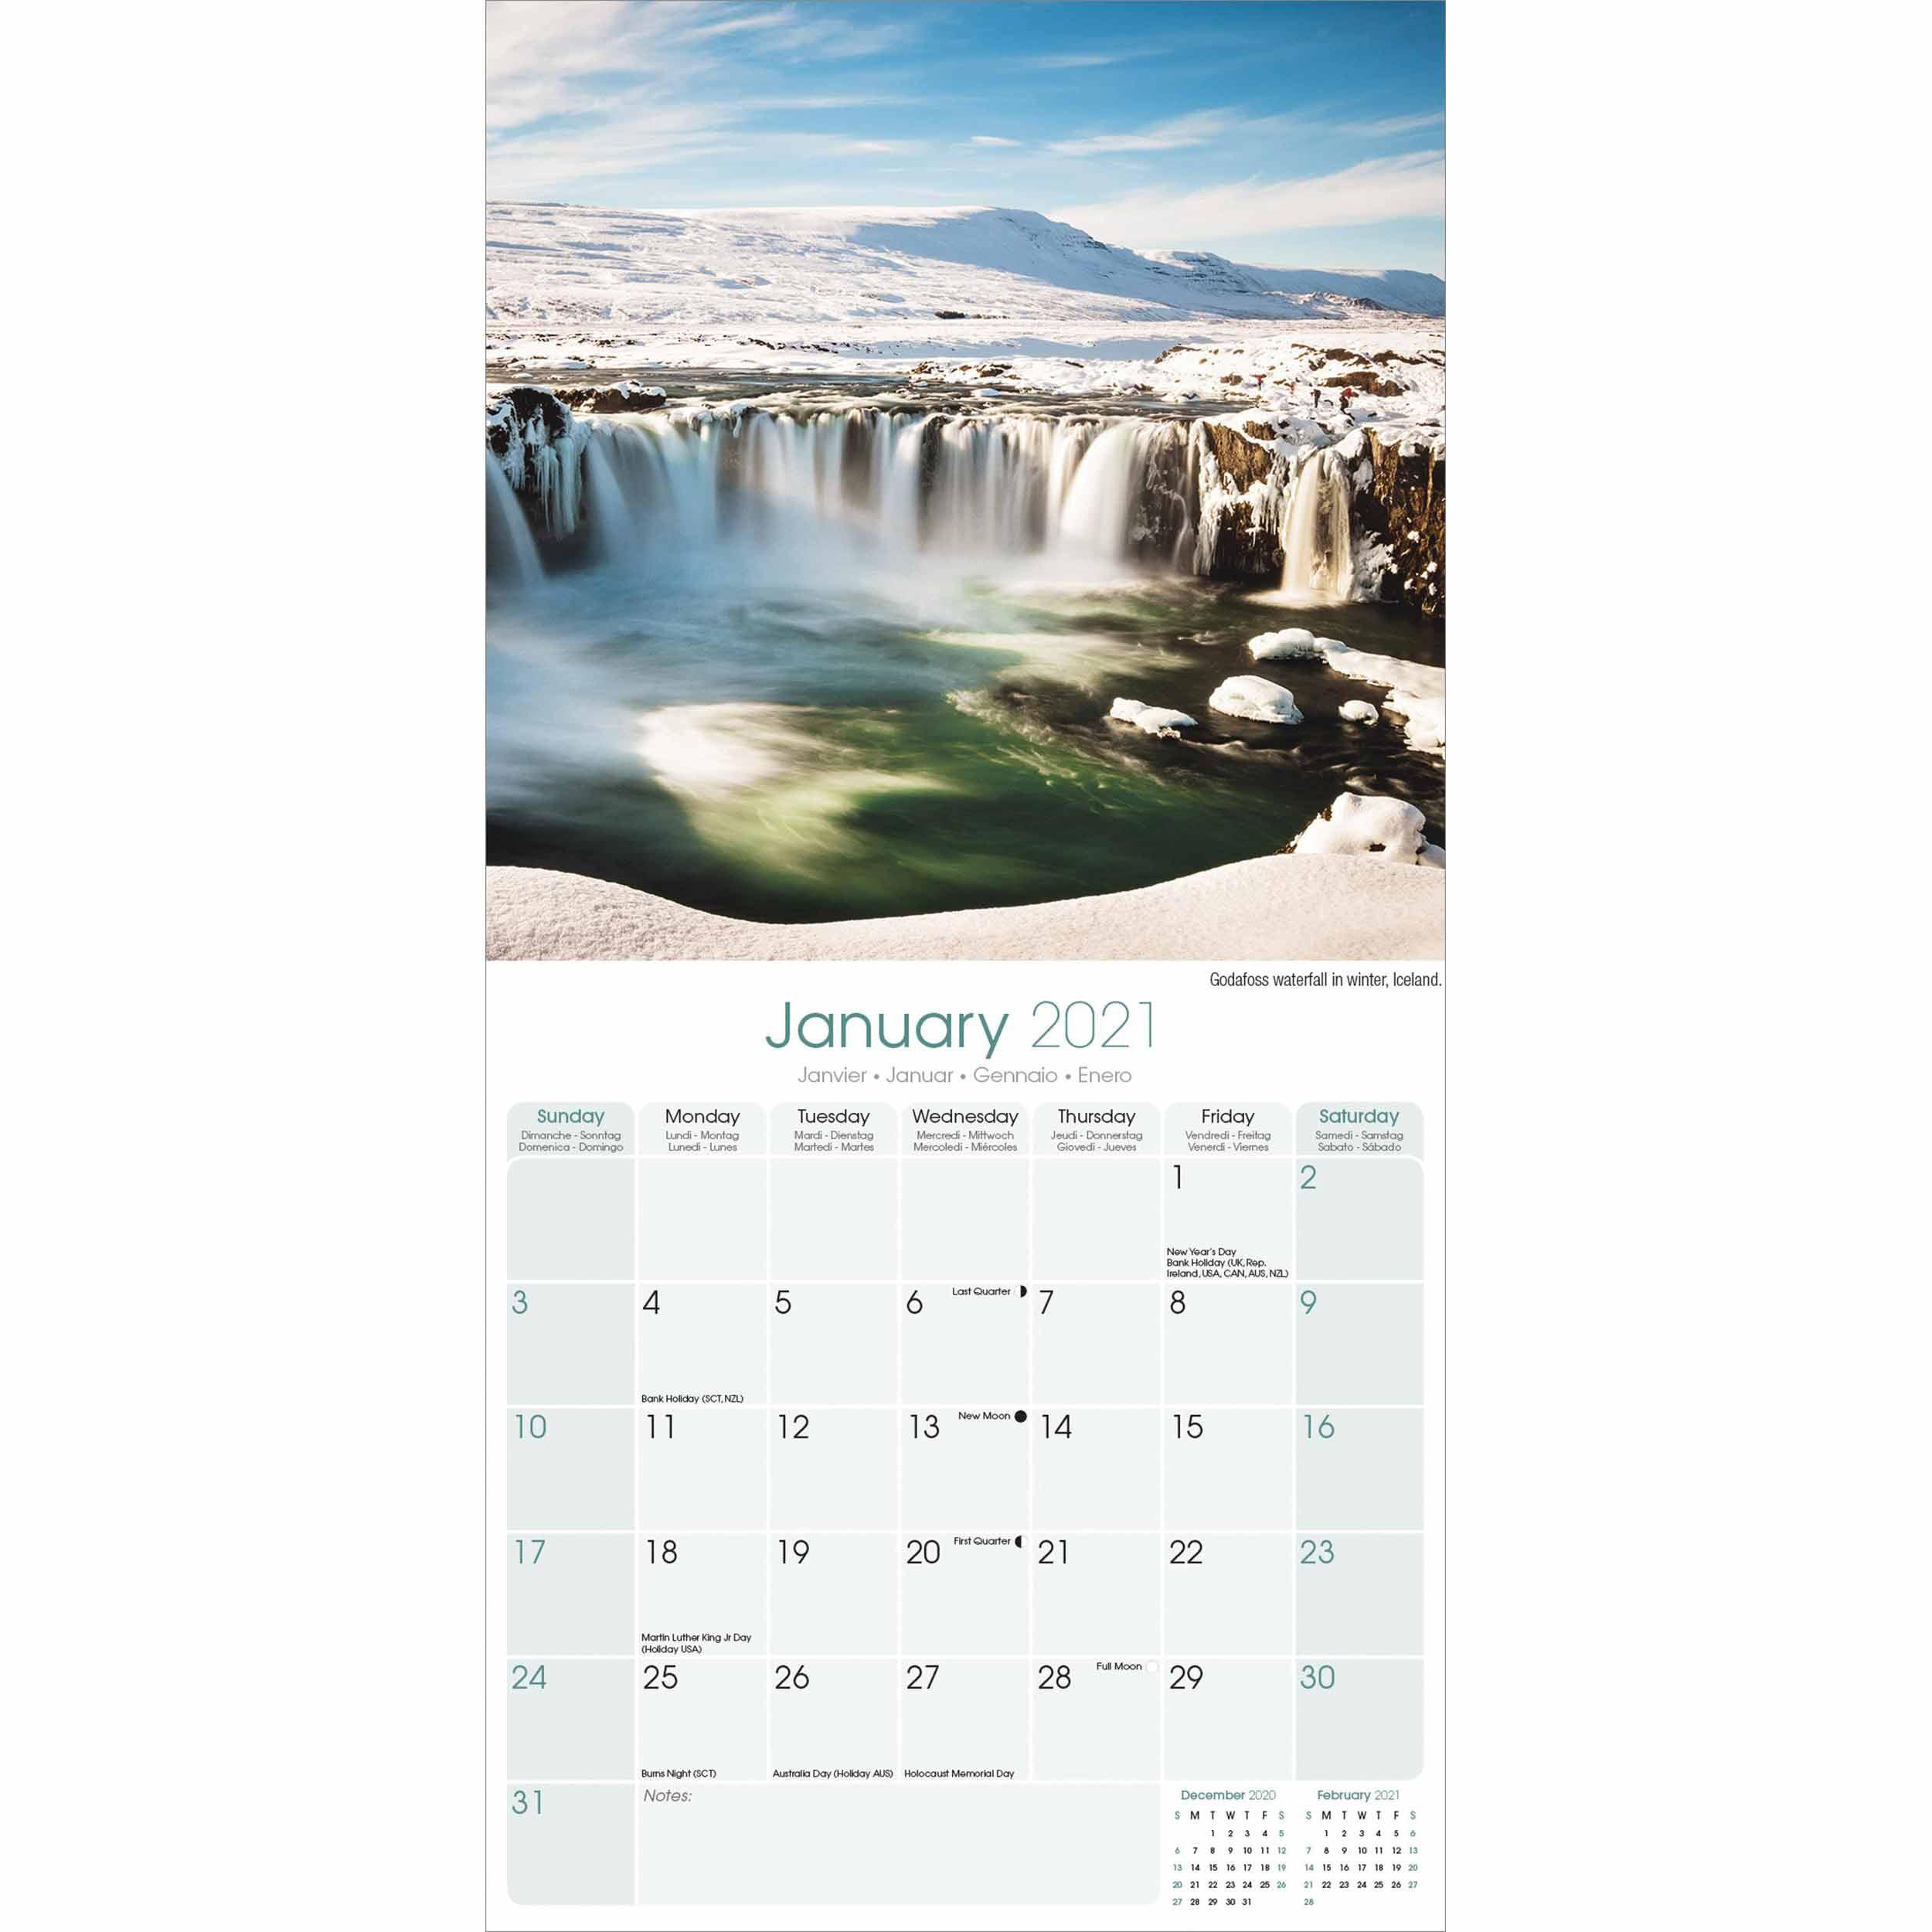 Waterfalls Calendar 2021 At Calendar Club In Niagara Falls School Calendar 2021